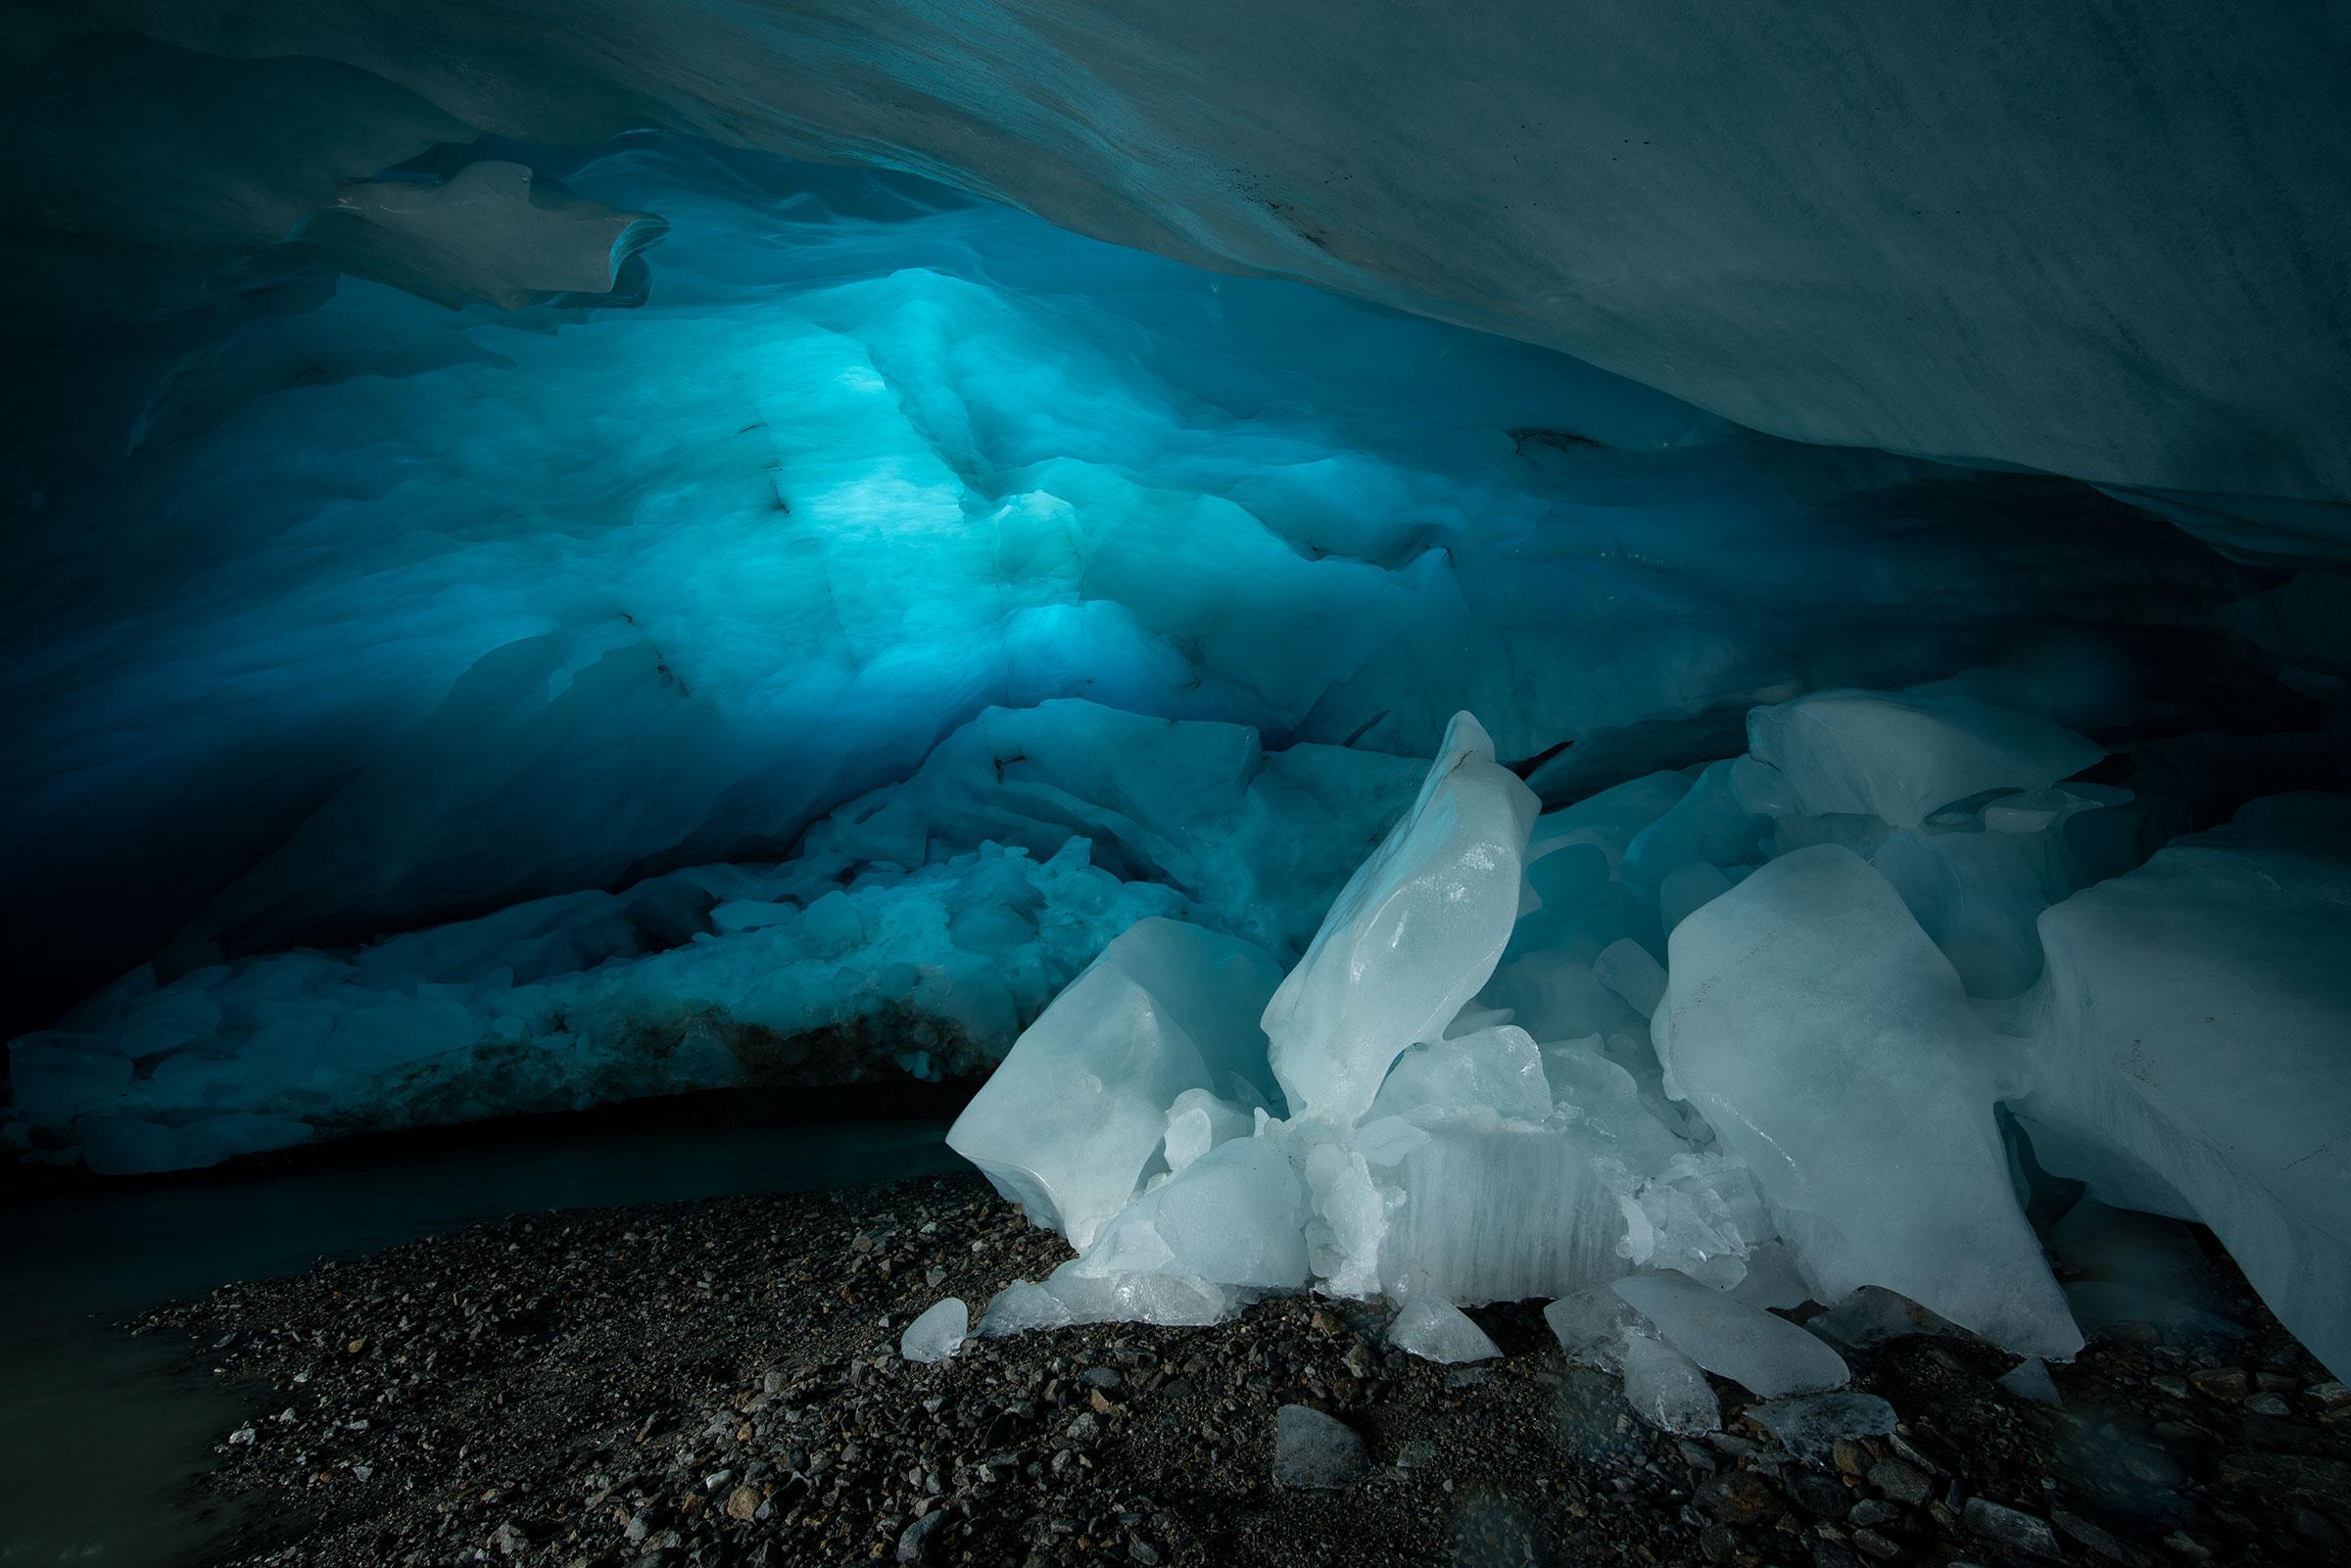 Ewiges Eis am Taschachferner - Ötztaler Gletscher